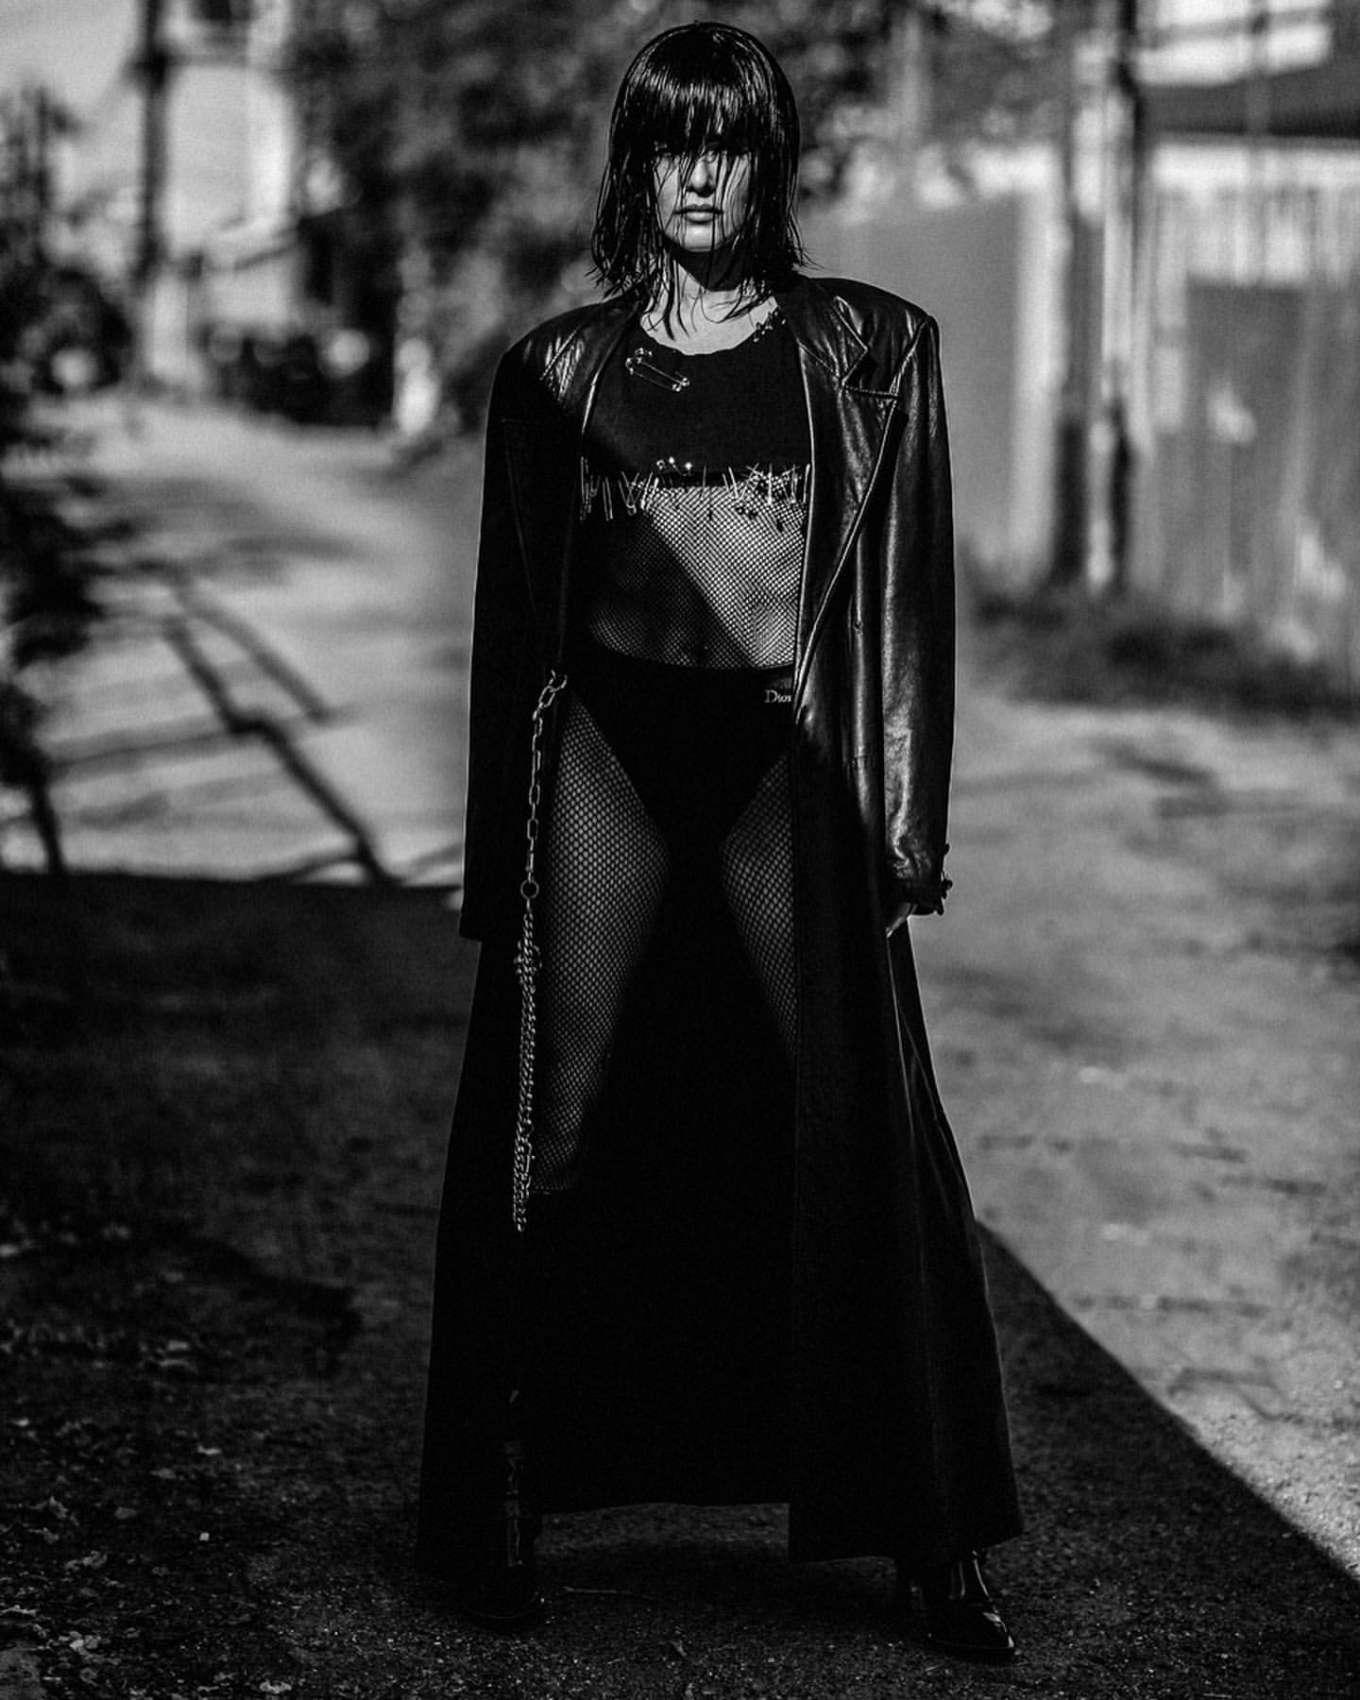 Zoey Deutch 2020 : Zoey Deutch by Damon Baker Photoshoot 2020-05